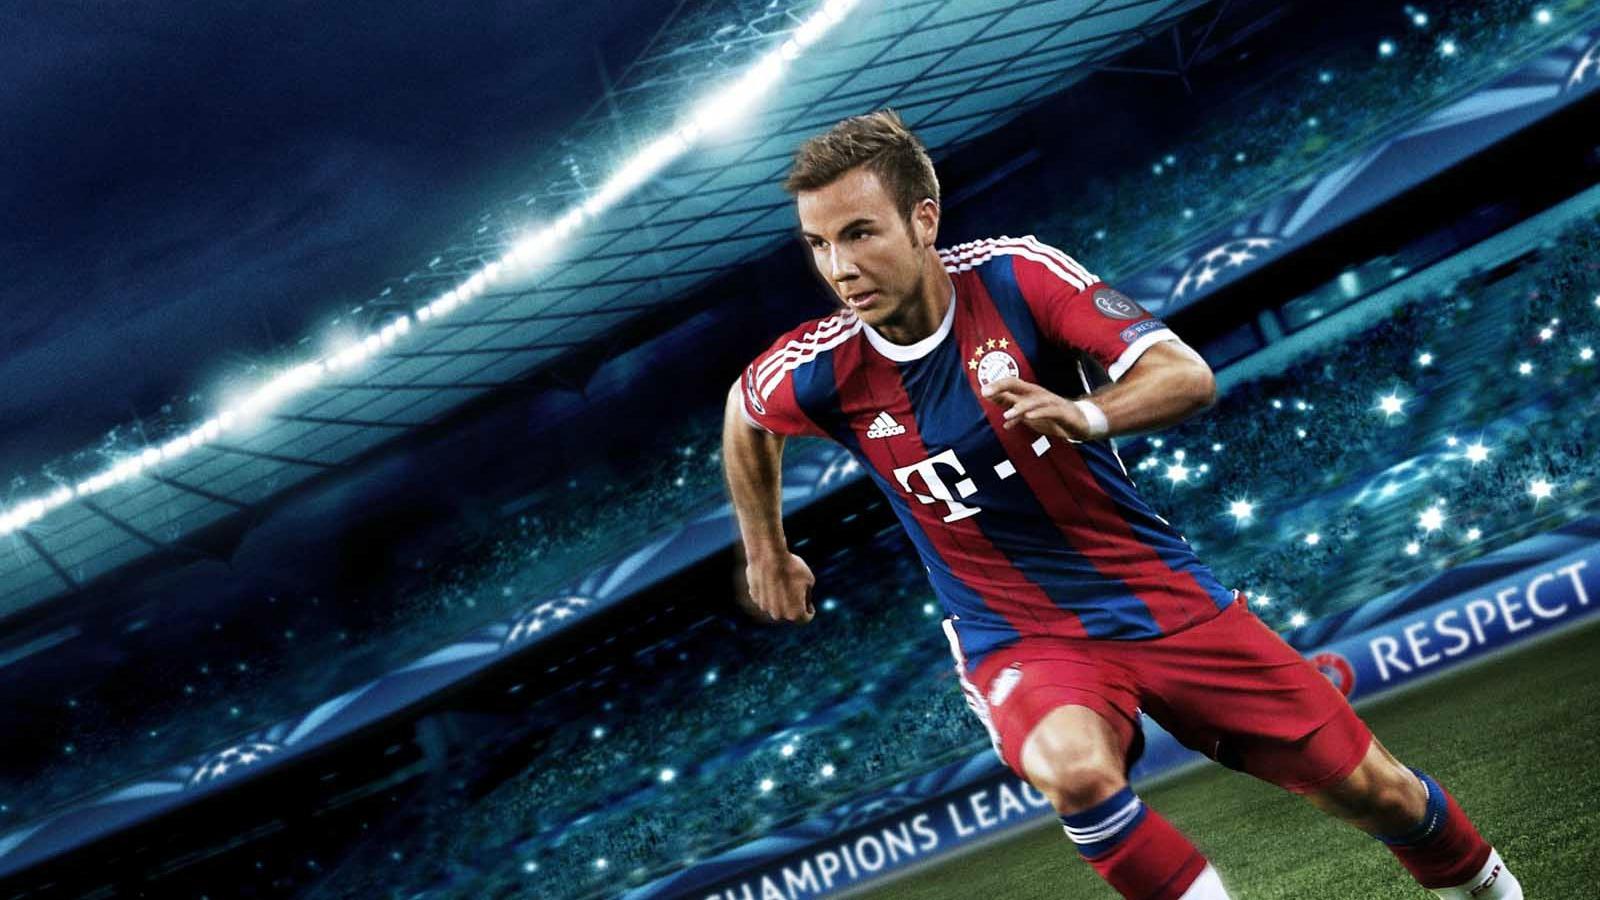 Pro Evolution Soccer 2015 A